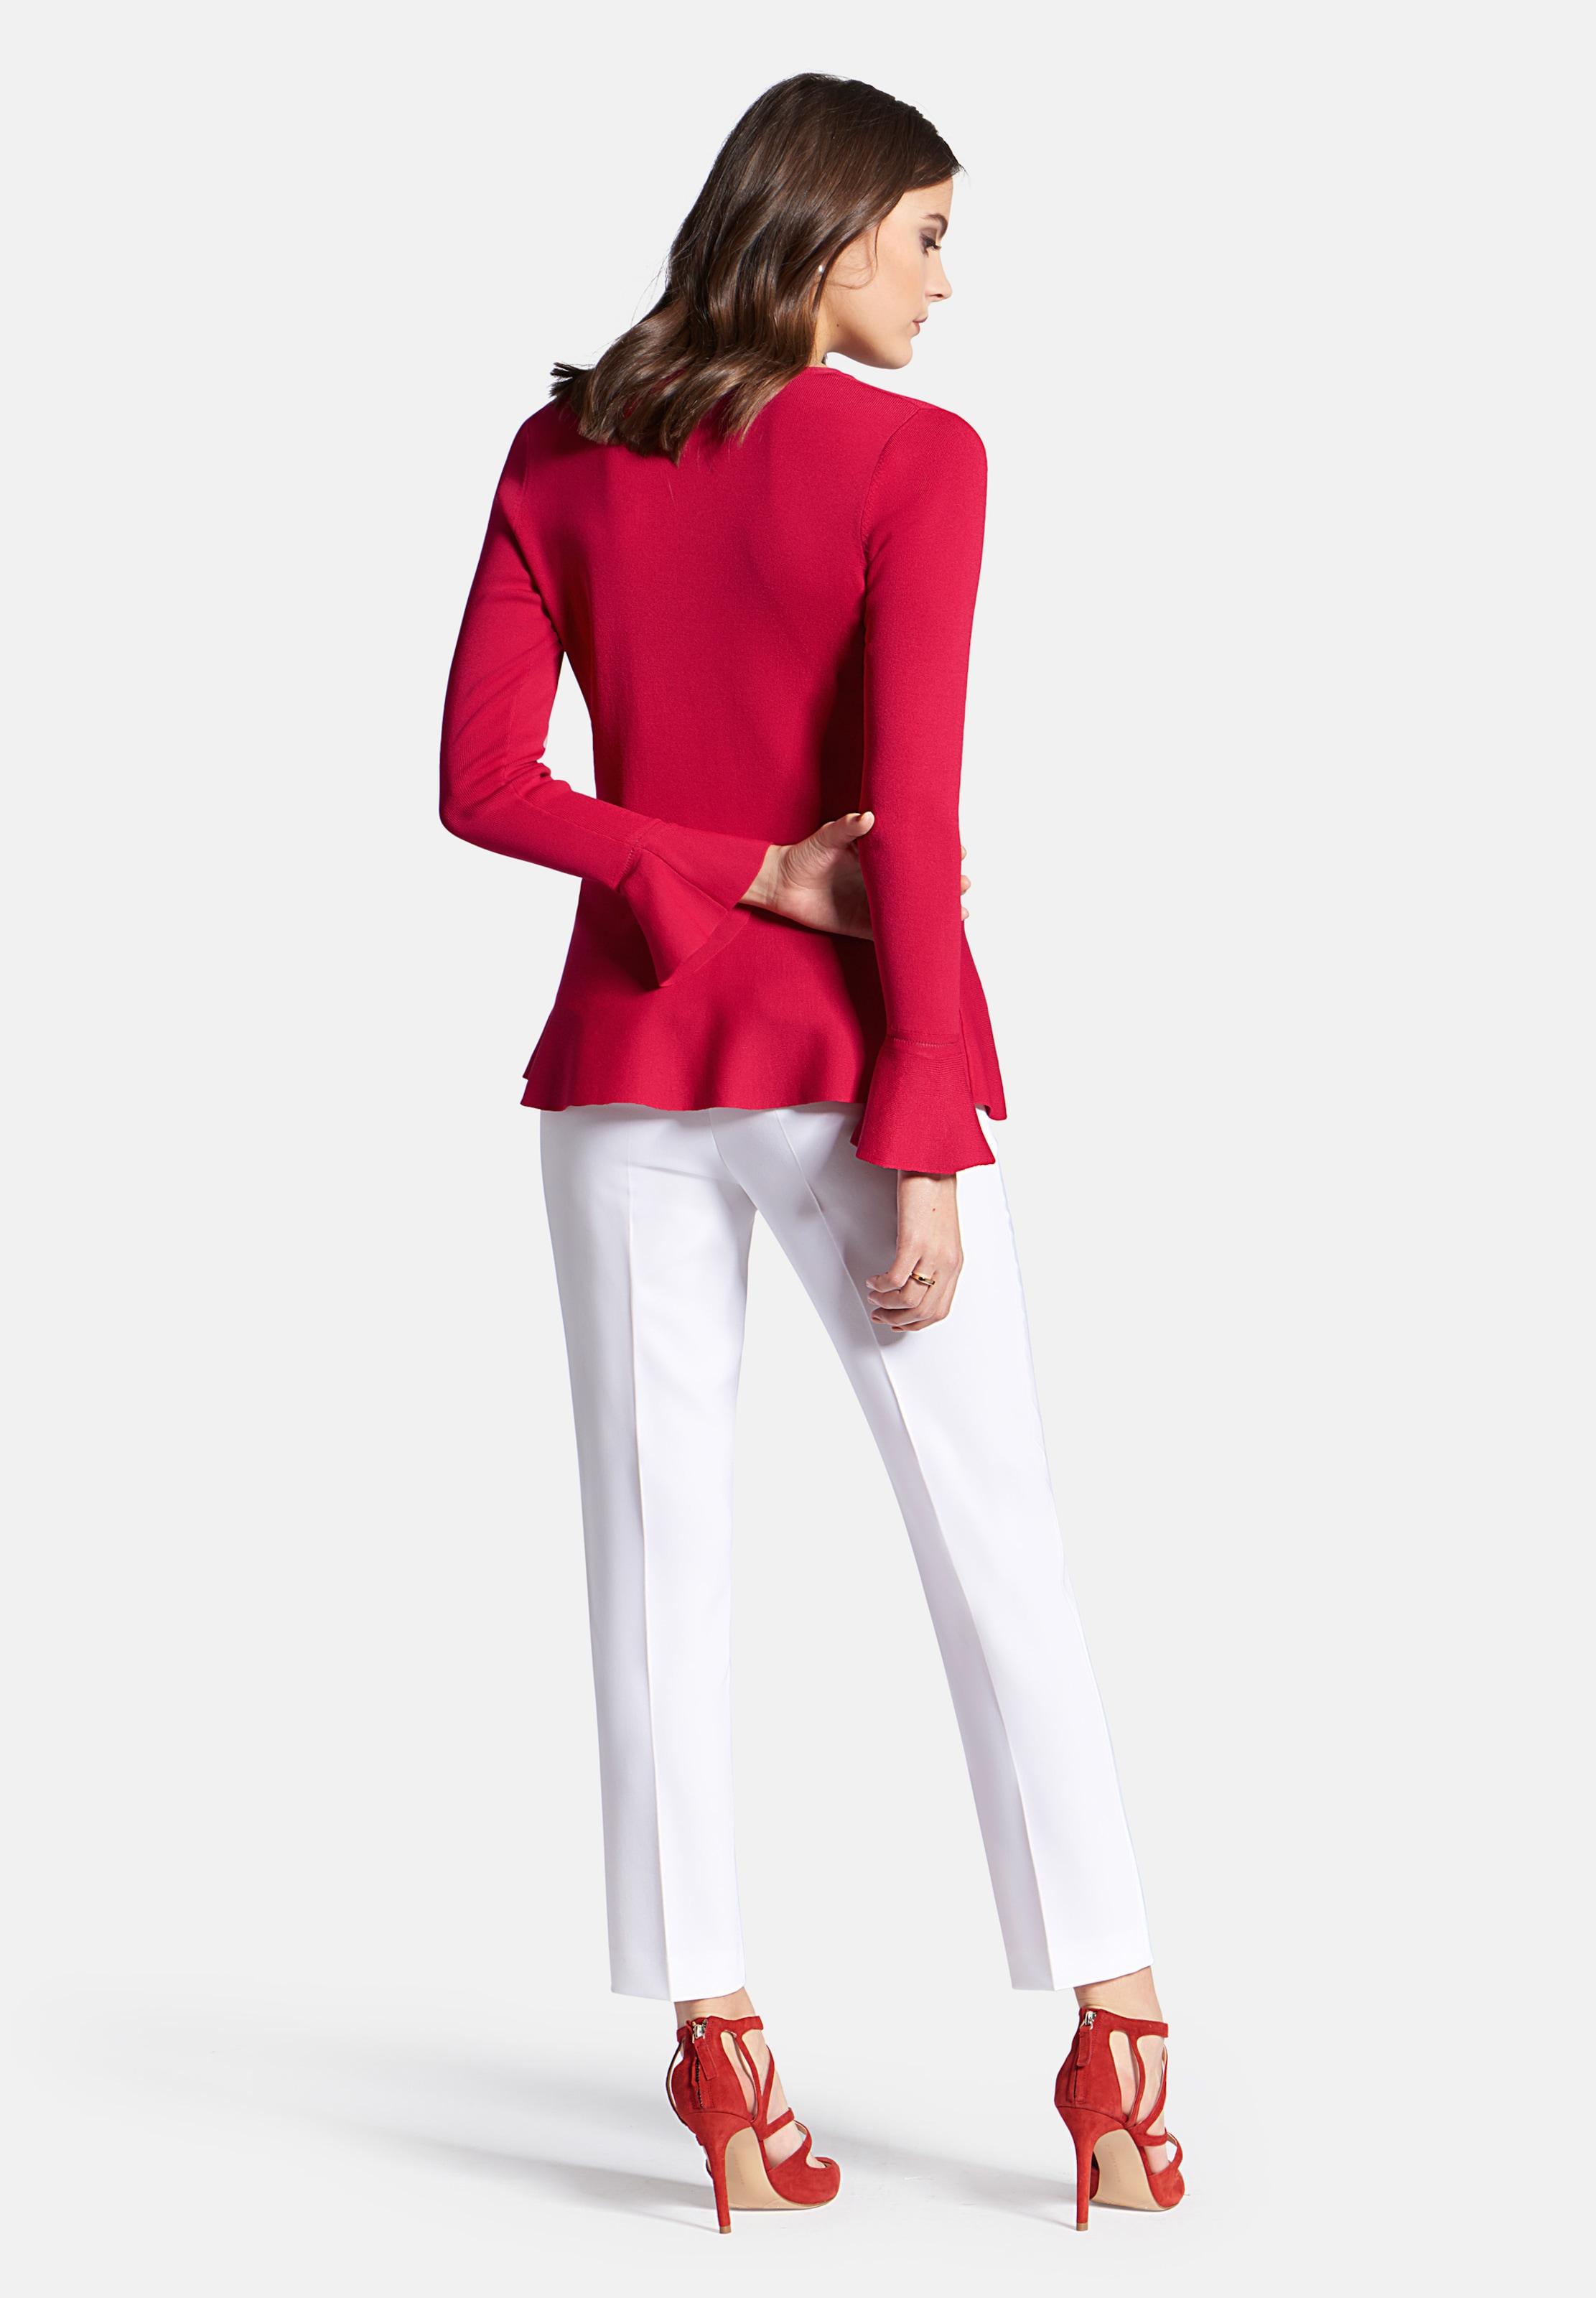 Pullover Pullover Rot Raasch Uta Raasch Rot Uta Uta In In Raasch DHYI2eE9W